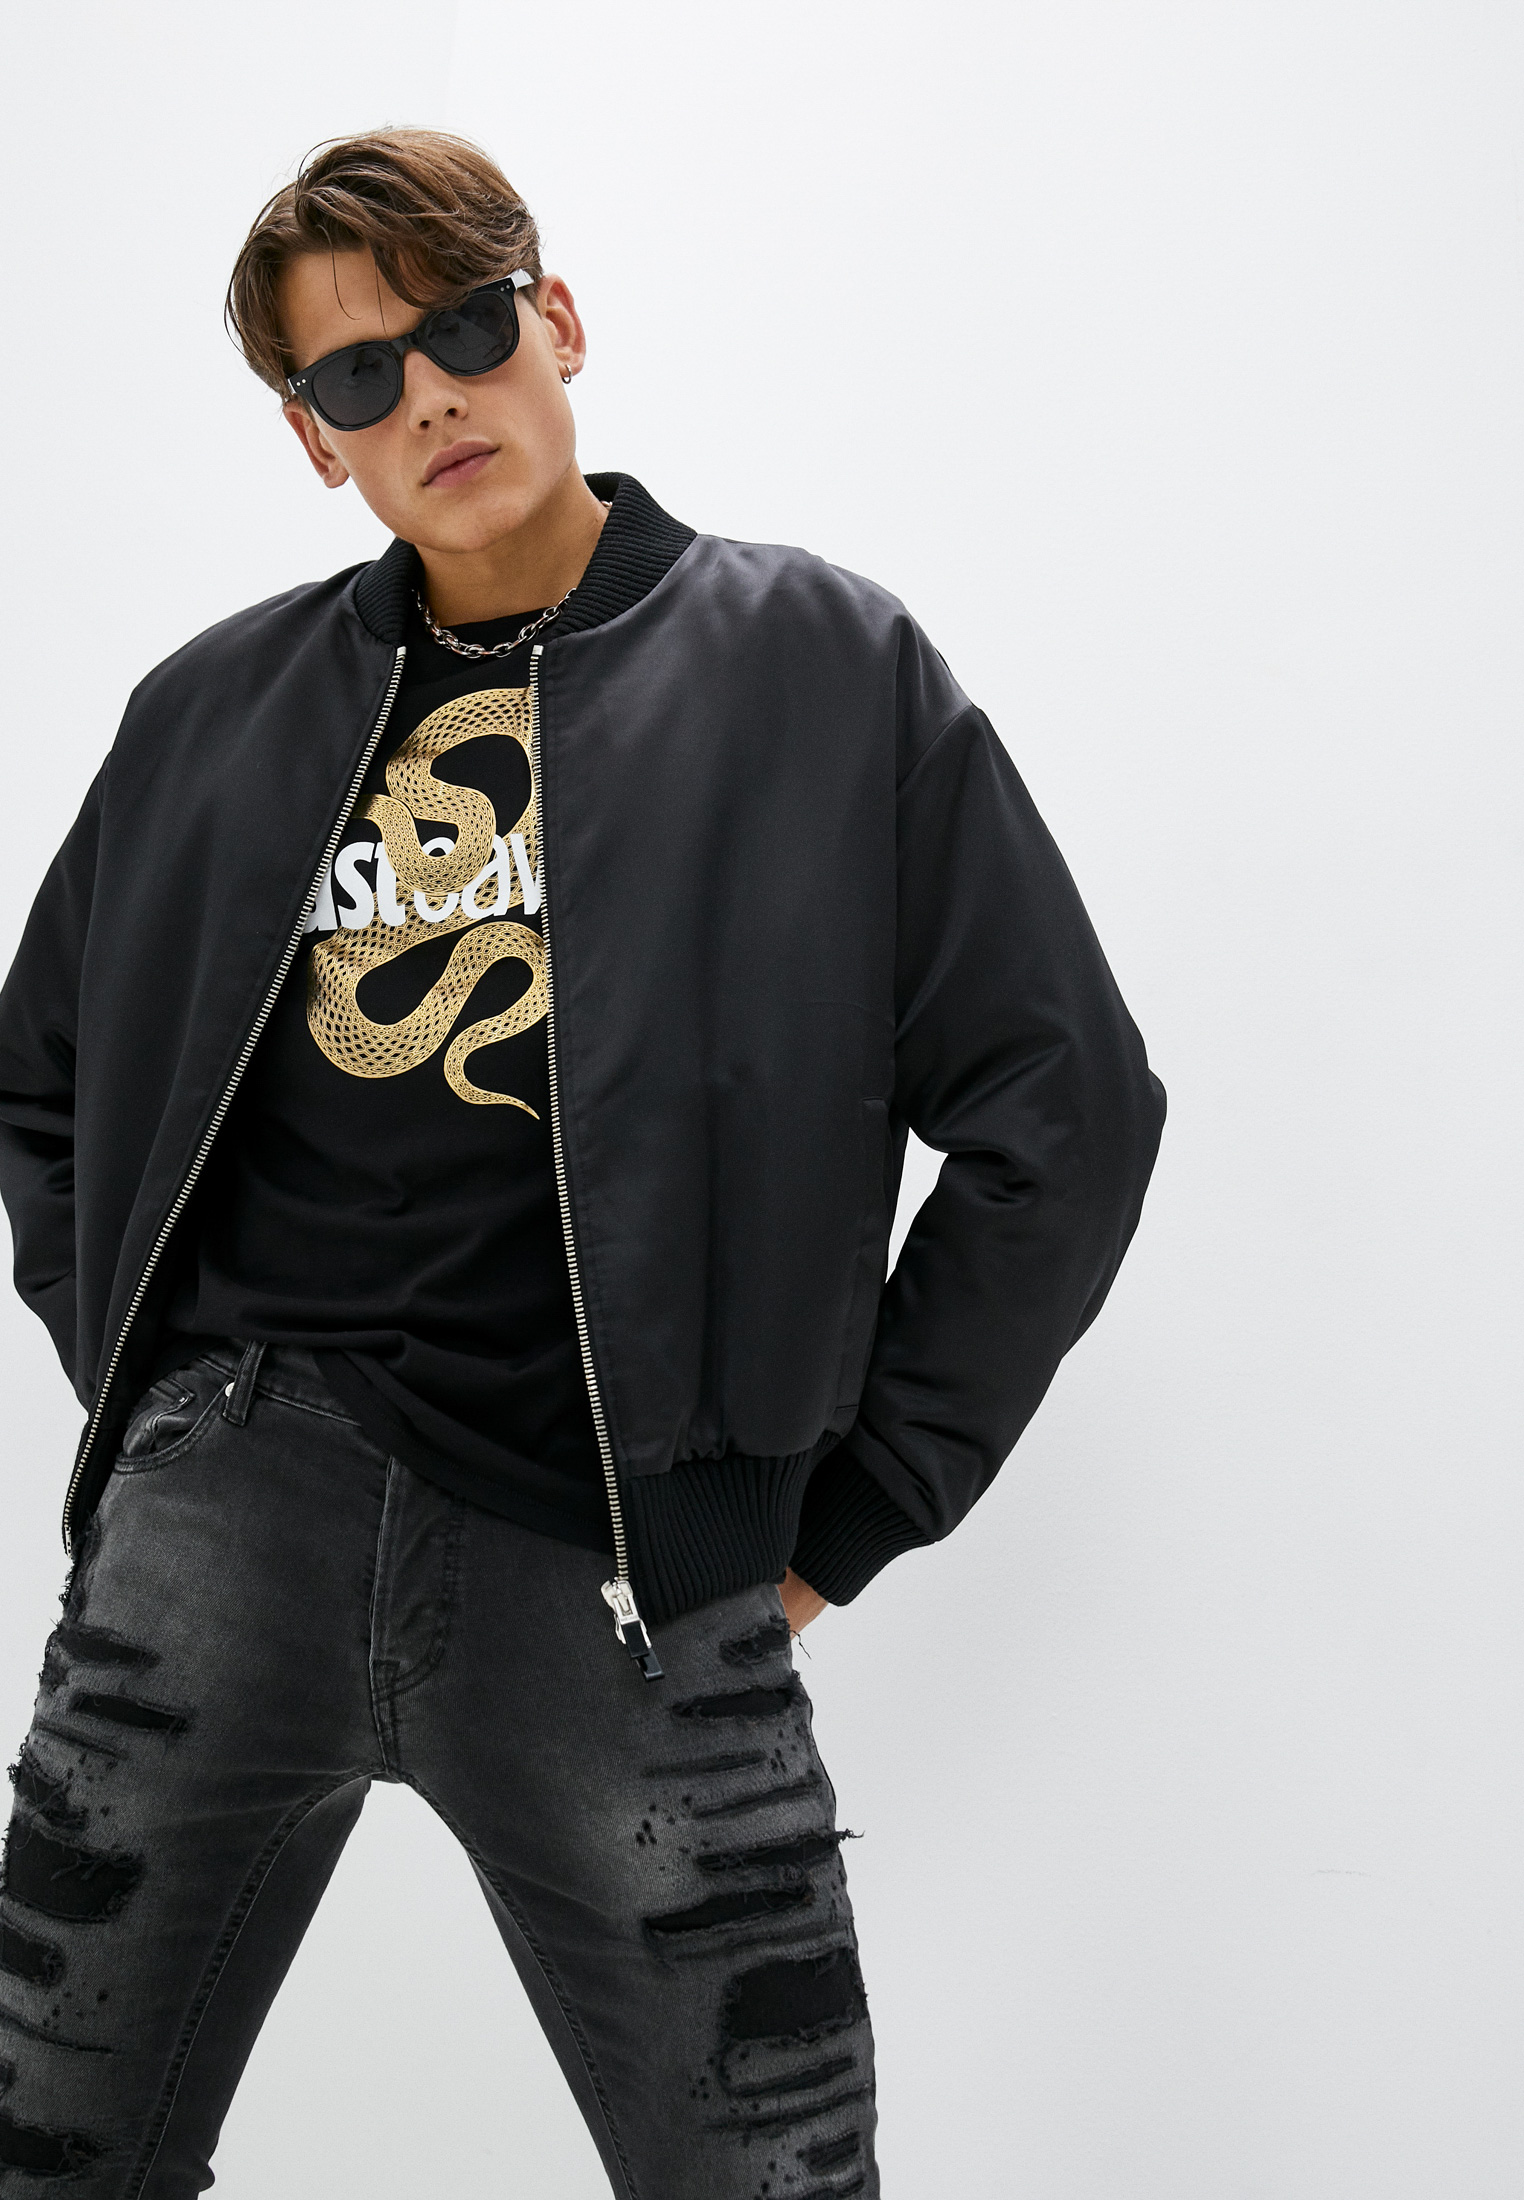 Мужская верхняя одежда Just Cavalli (Джаст Кавалли) Куртка утепленная Just Cavalli